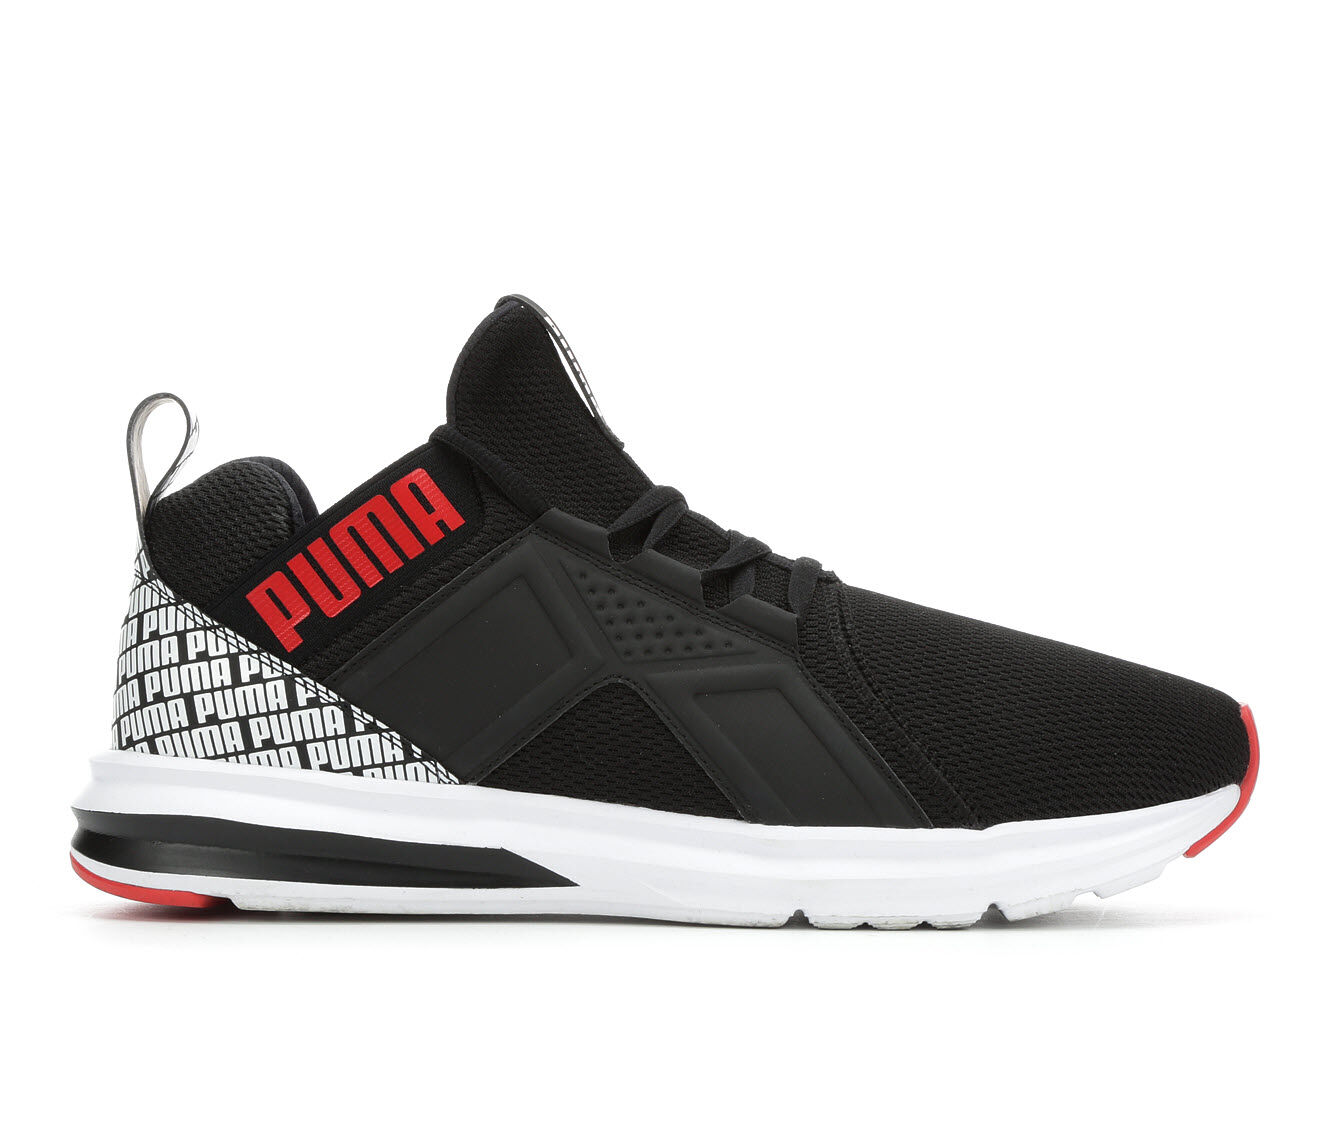 uk shoes_kd1465